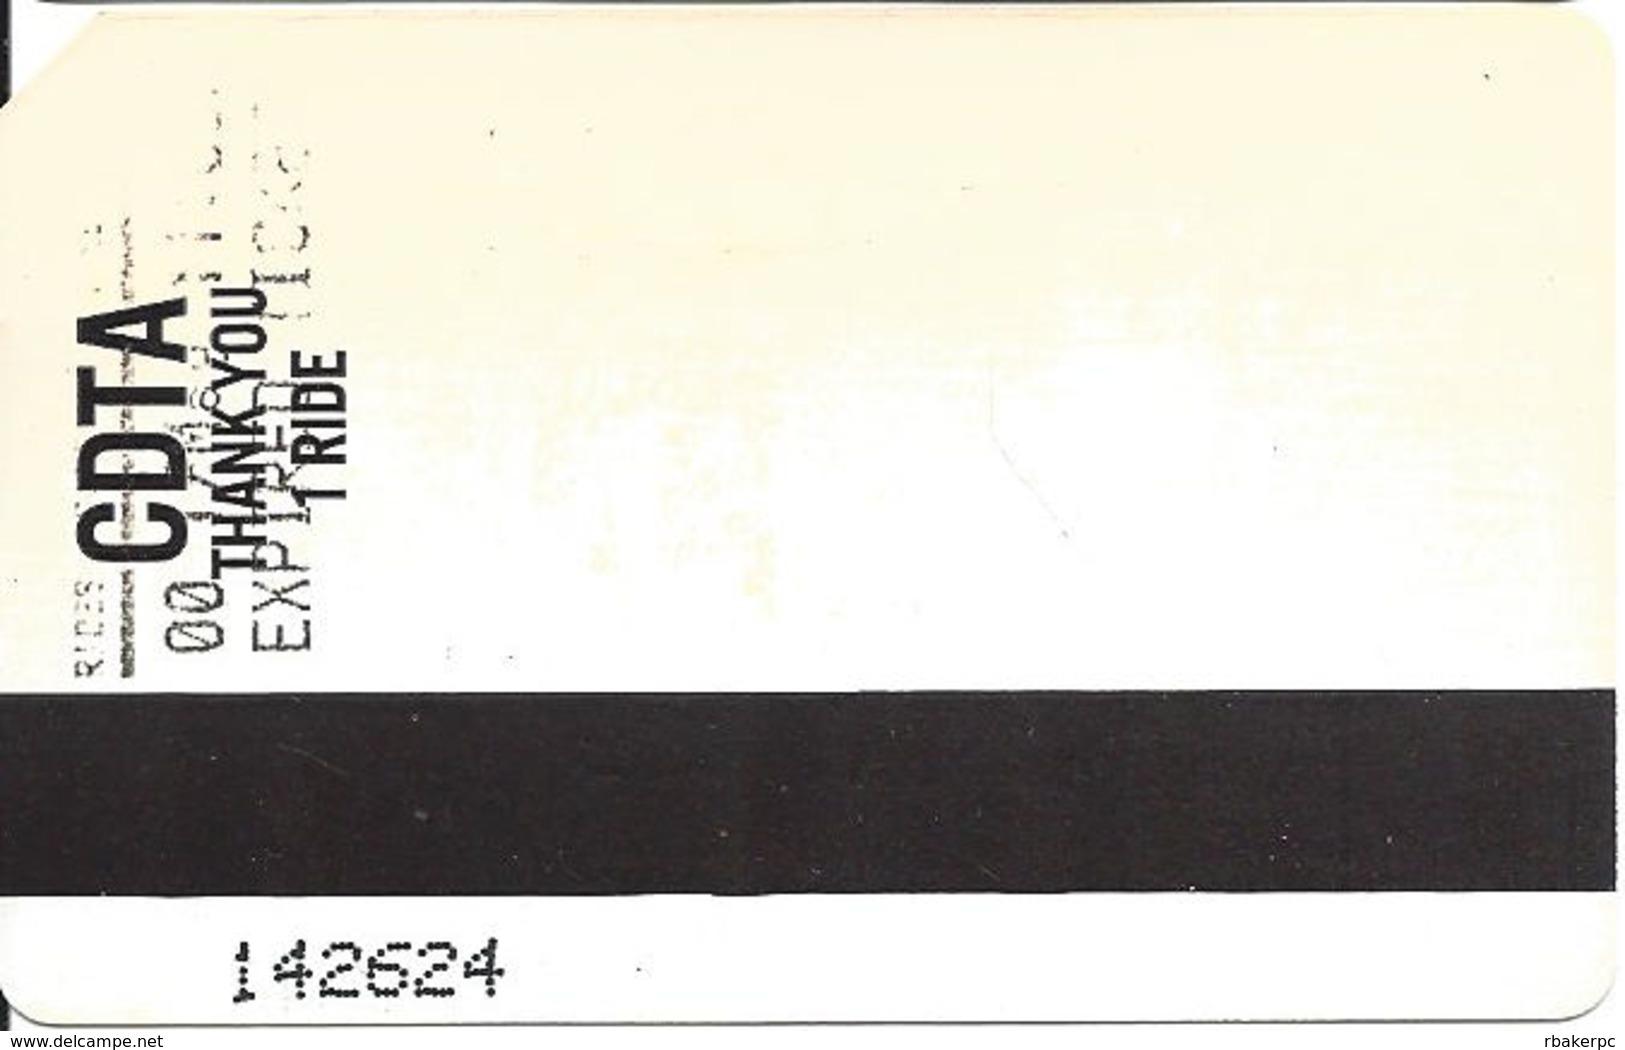 Paper CDTA One Ride Bus Ticket - Transportation Tickets